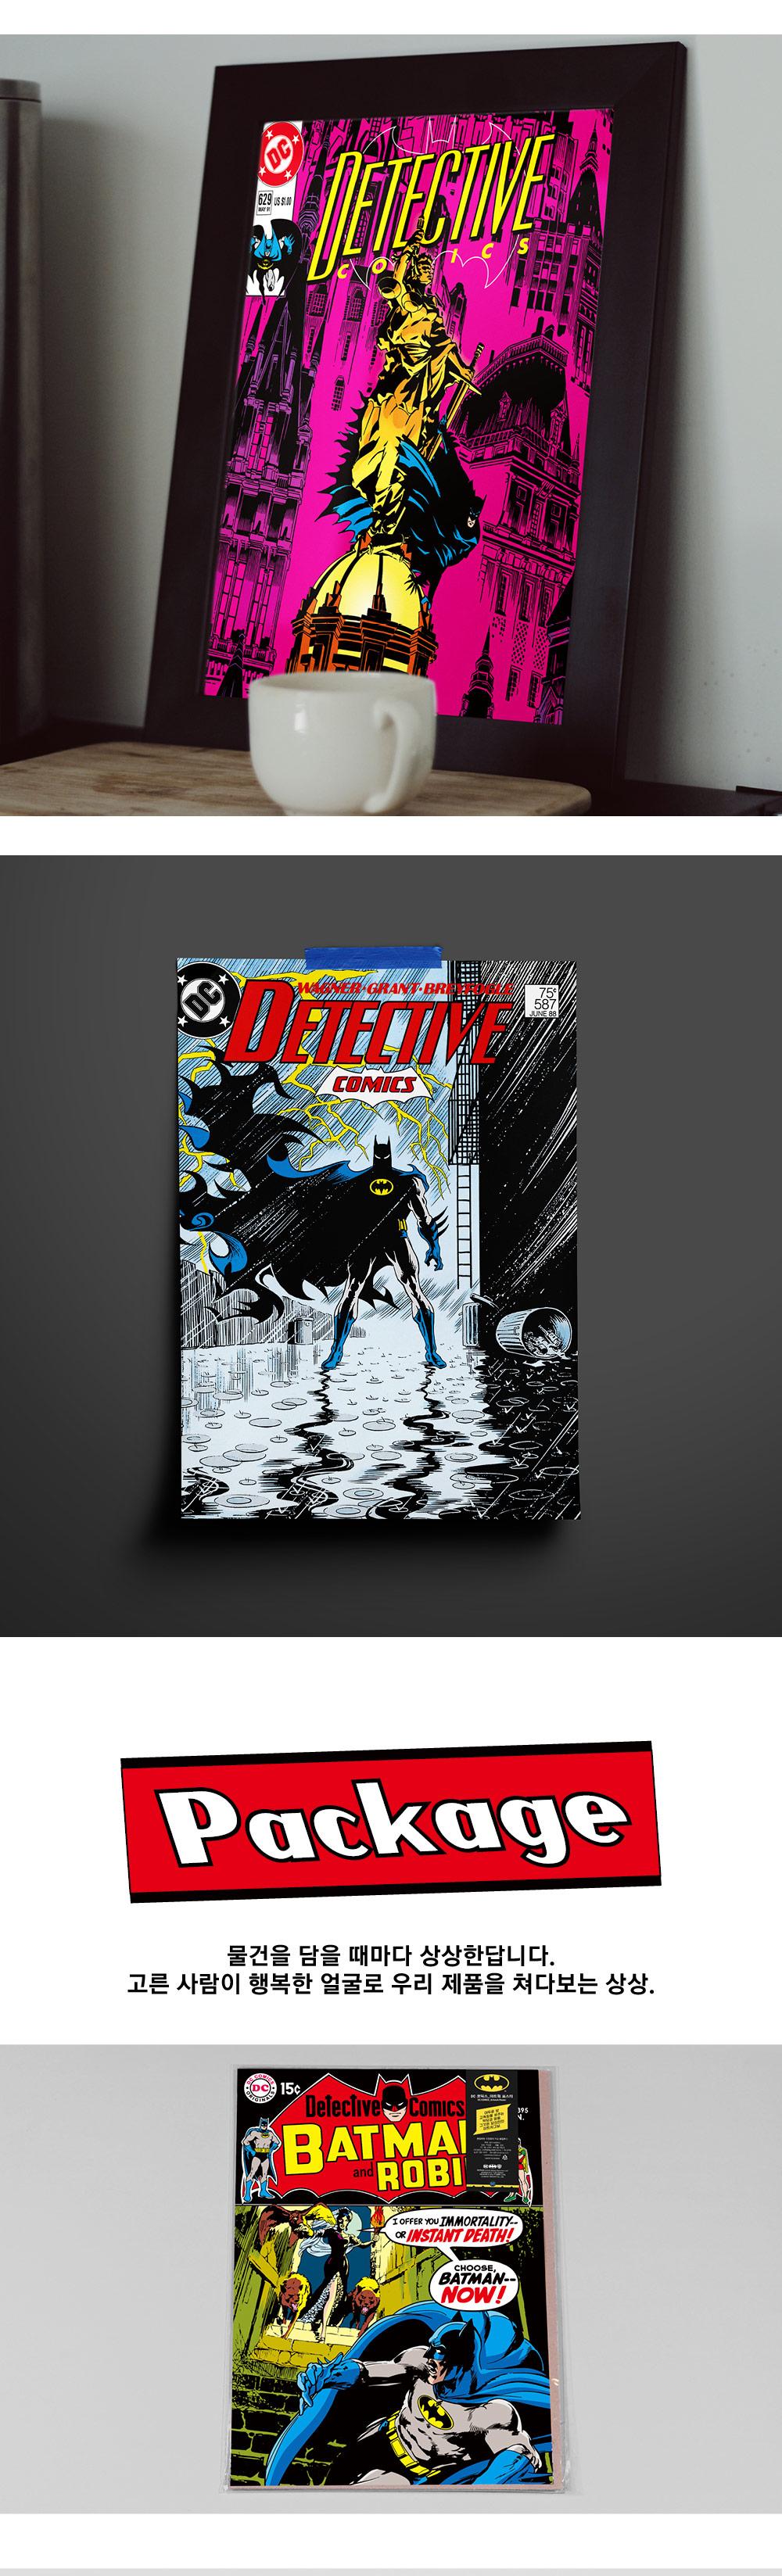 DC코믹스 인테리어 포스터_배트맨_05.jpg